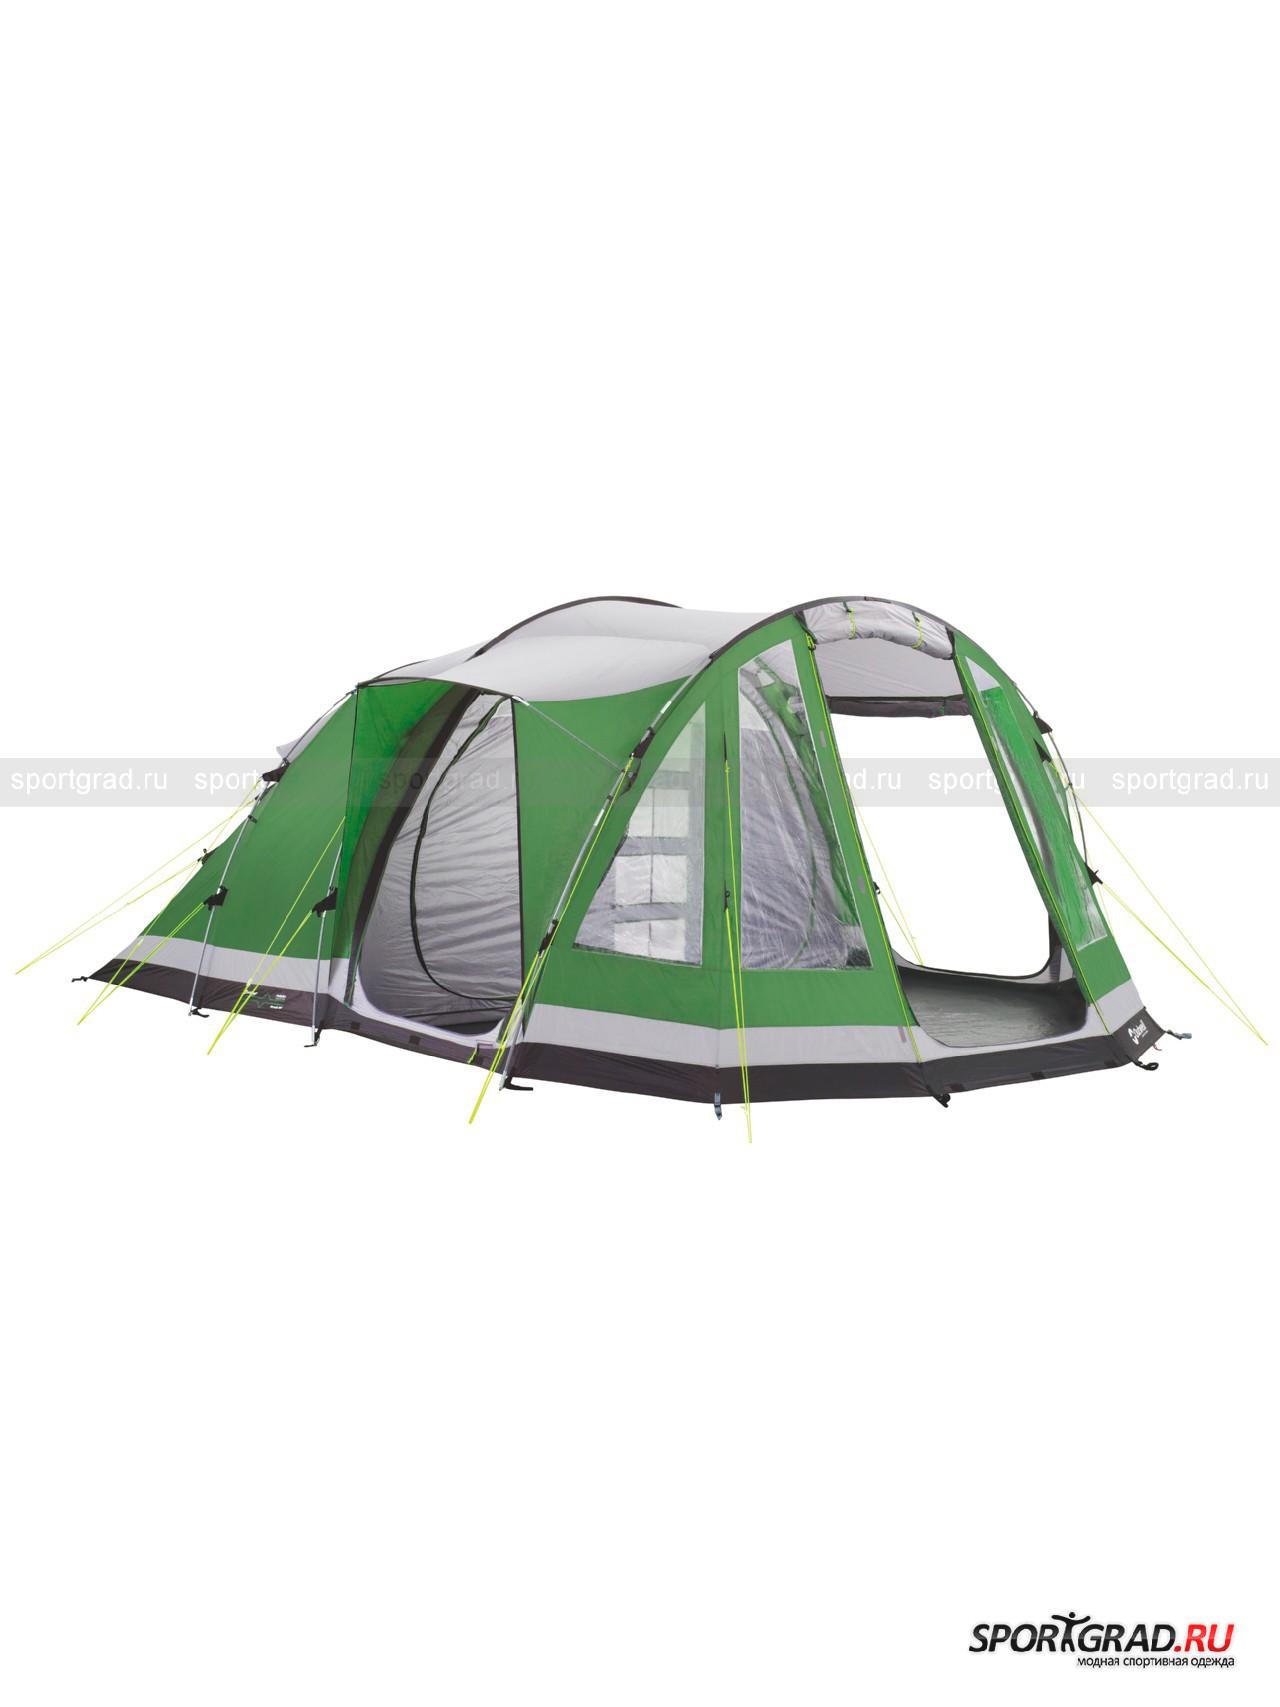 Палатка пятиместная Nevada MP Outwell